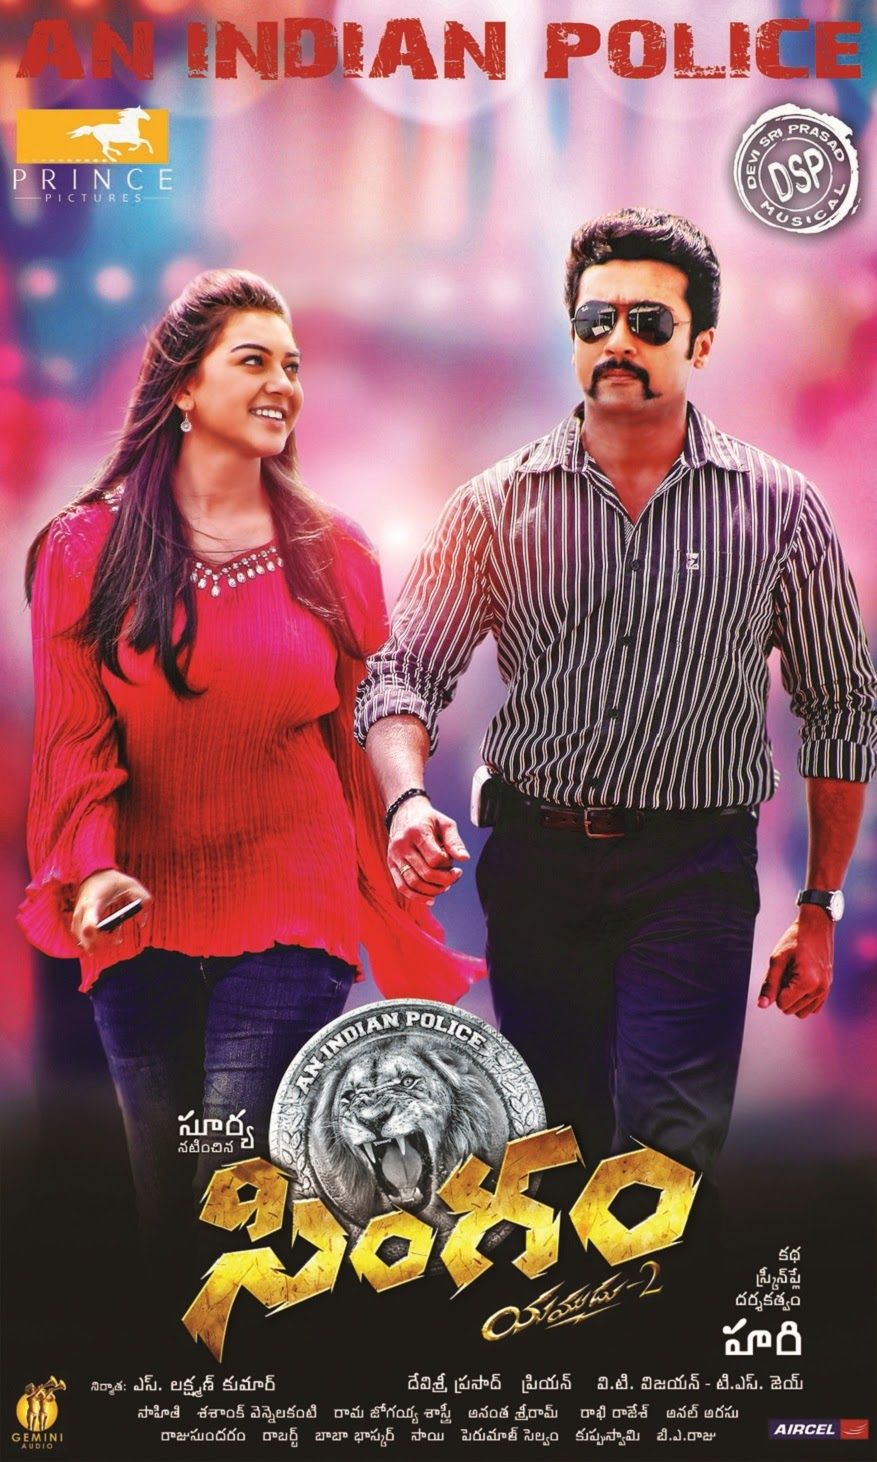 Singam - Yamudu 2 Telugu Songs